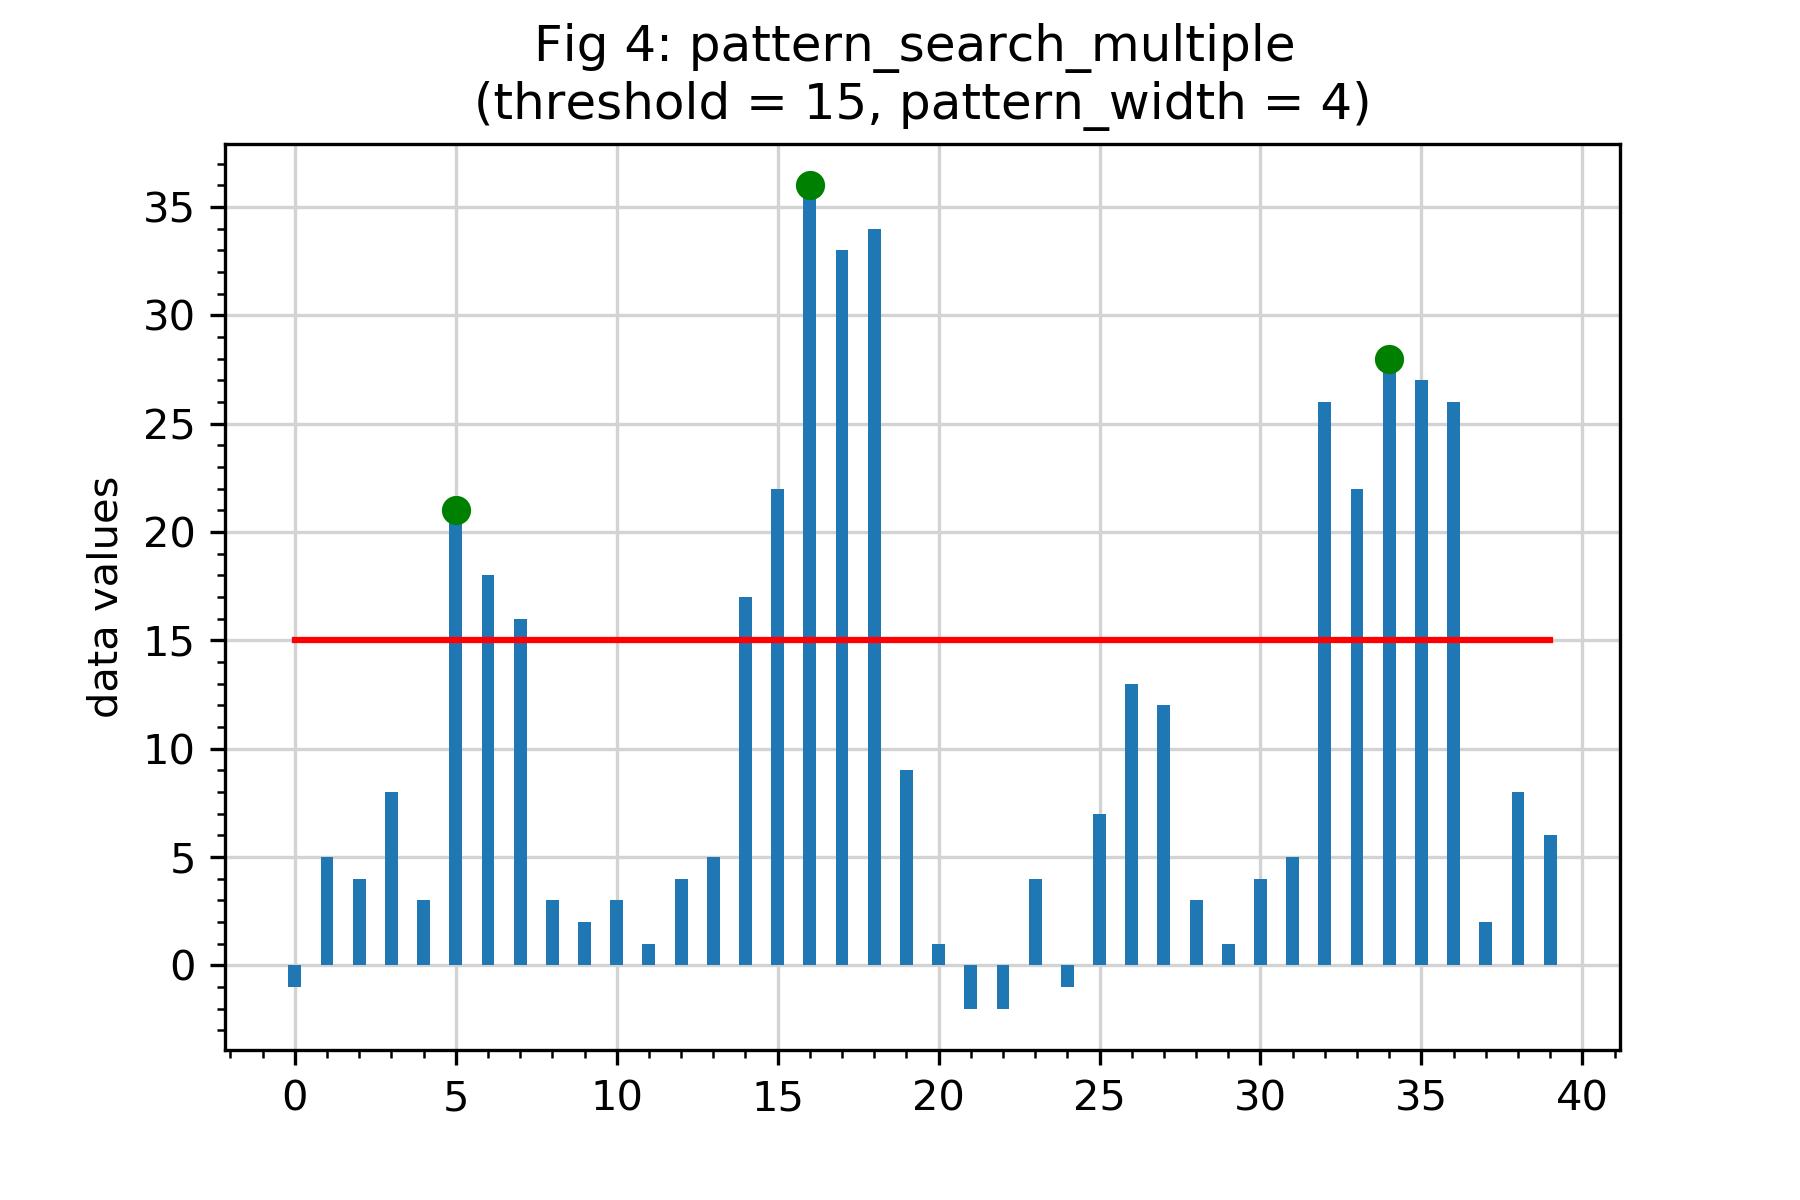 Similarity index